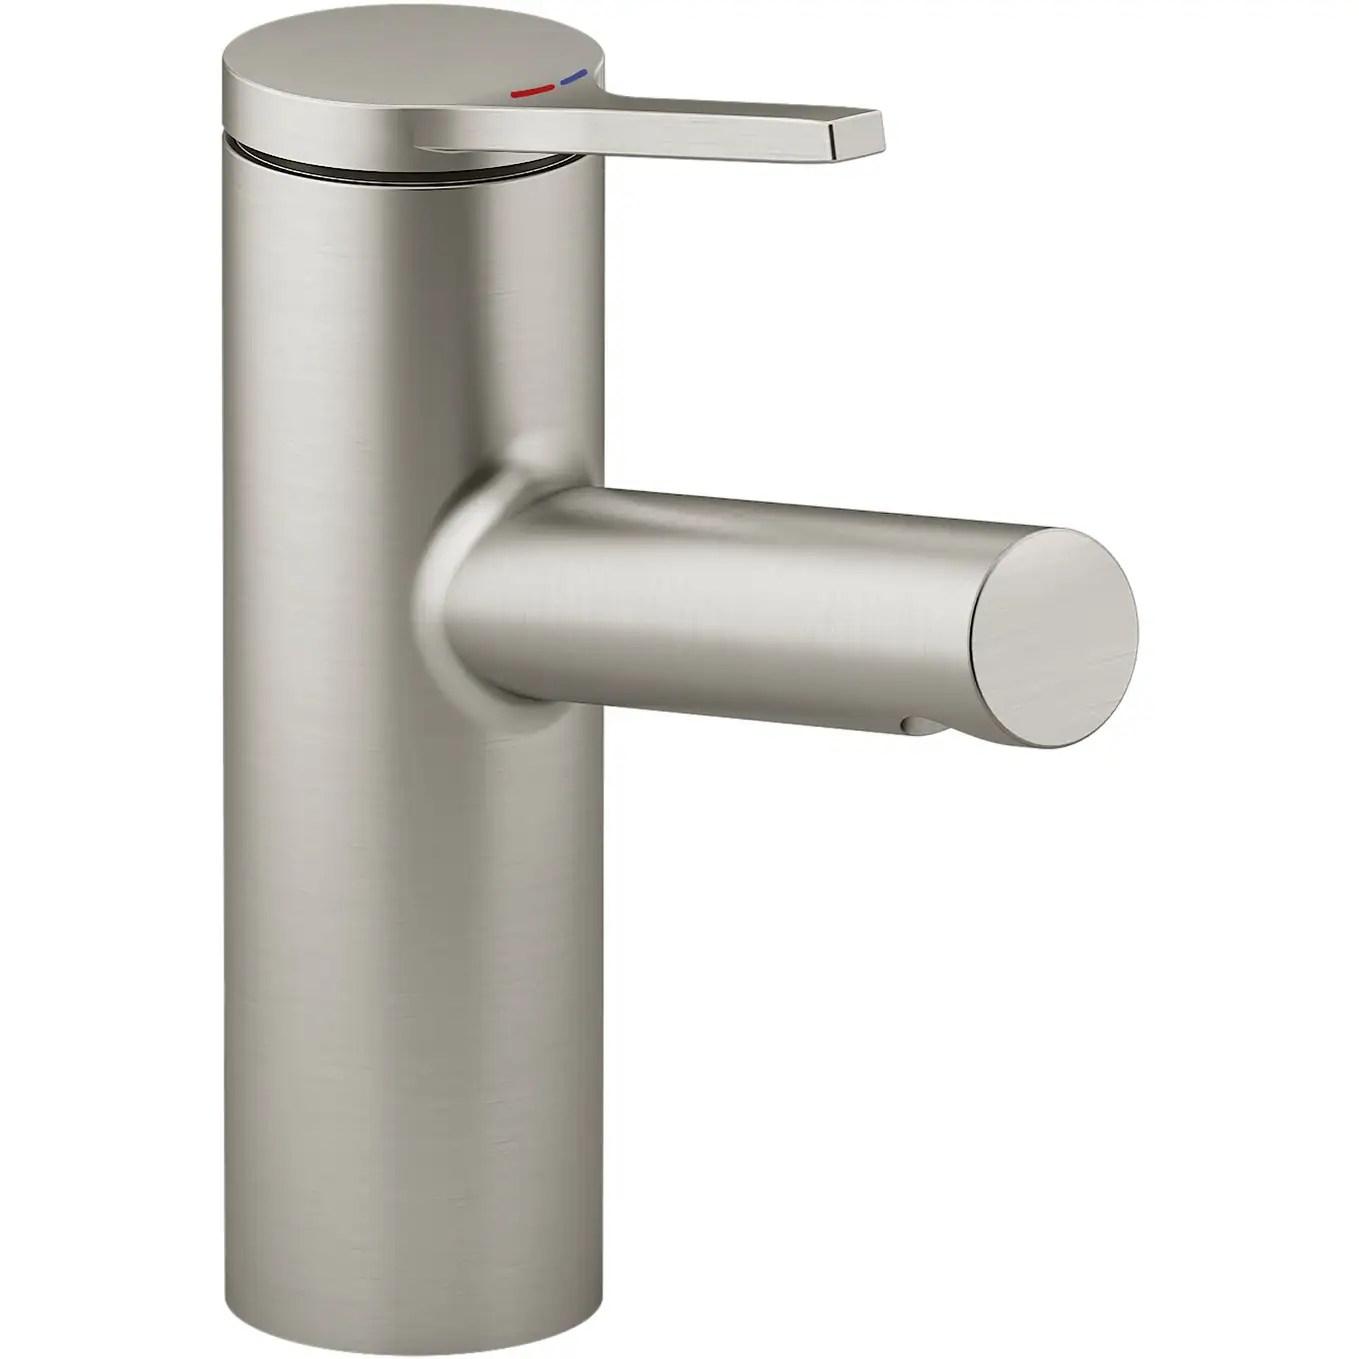 kohler k 99491 4 elate 1 2 gpm single hole bathroom faucet with pop up